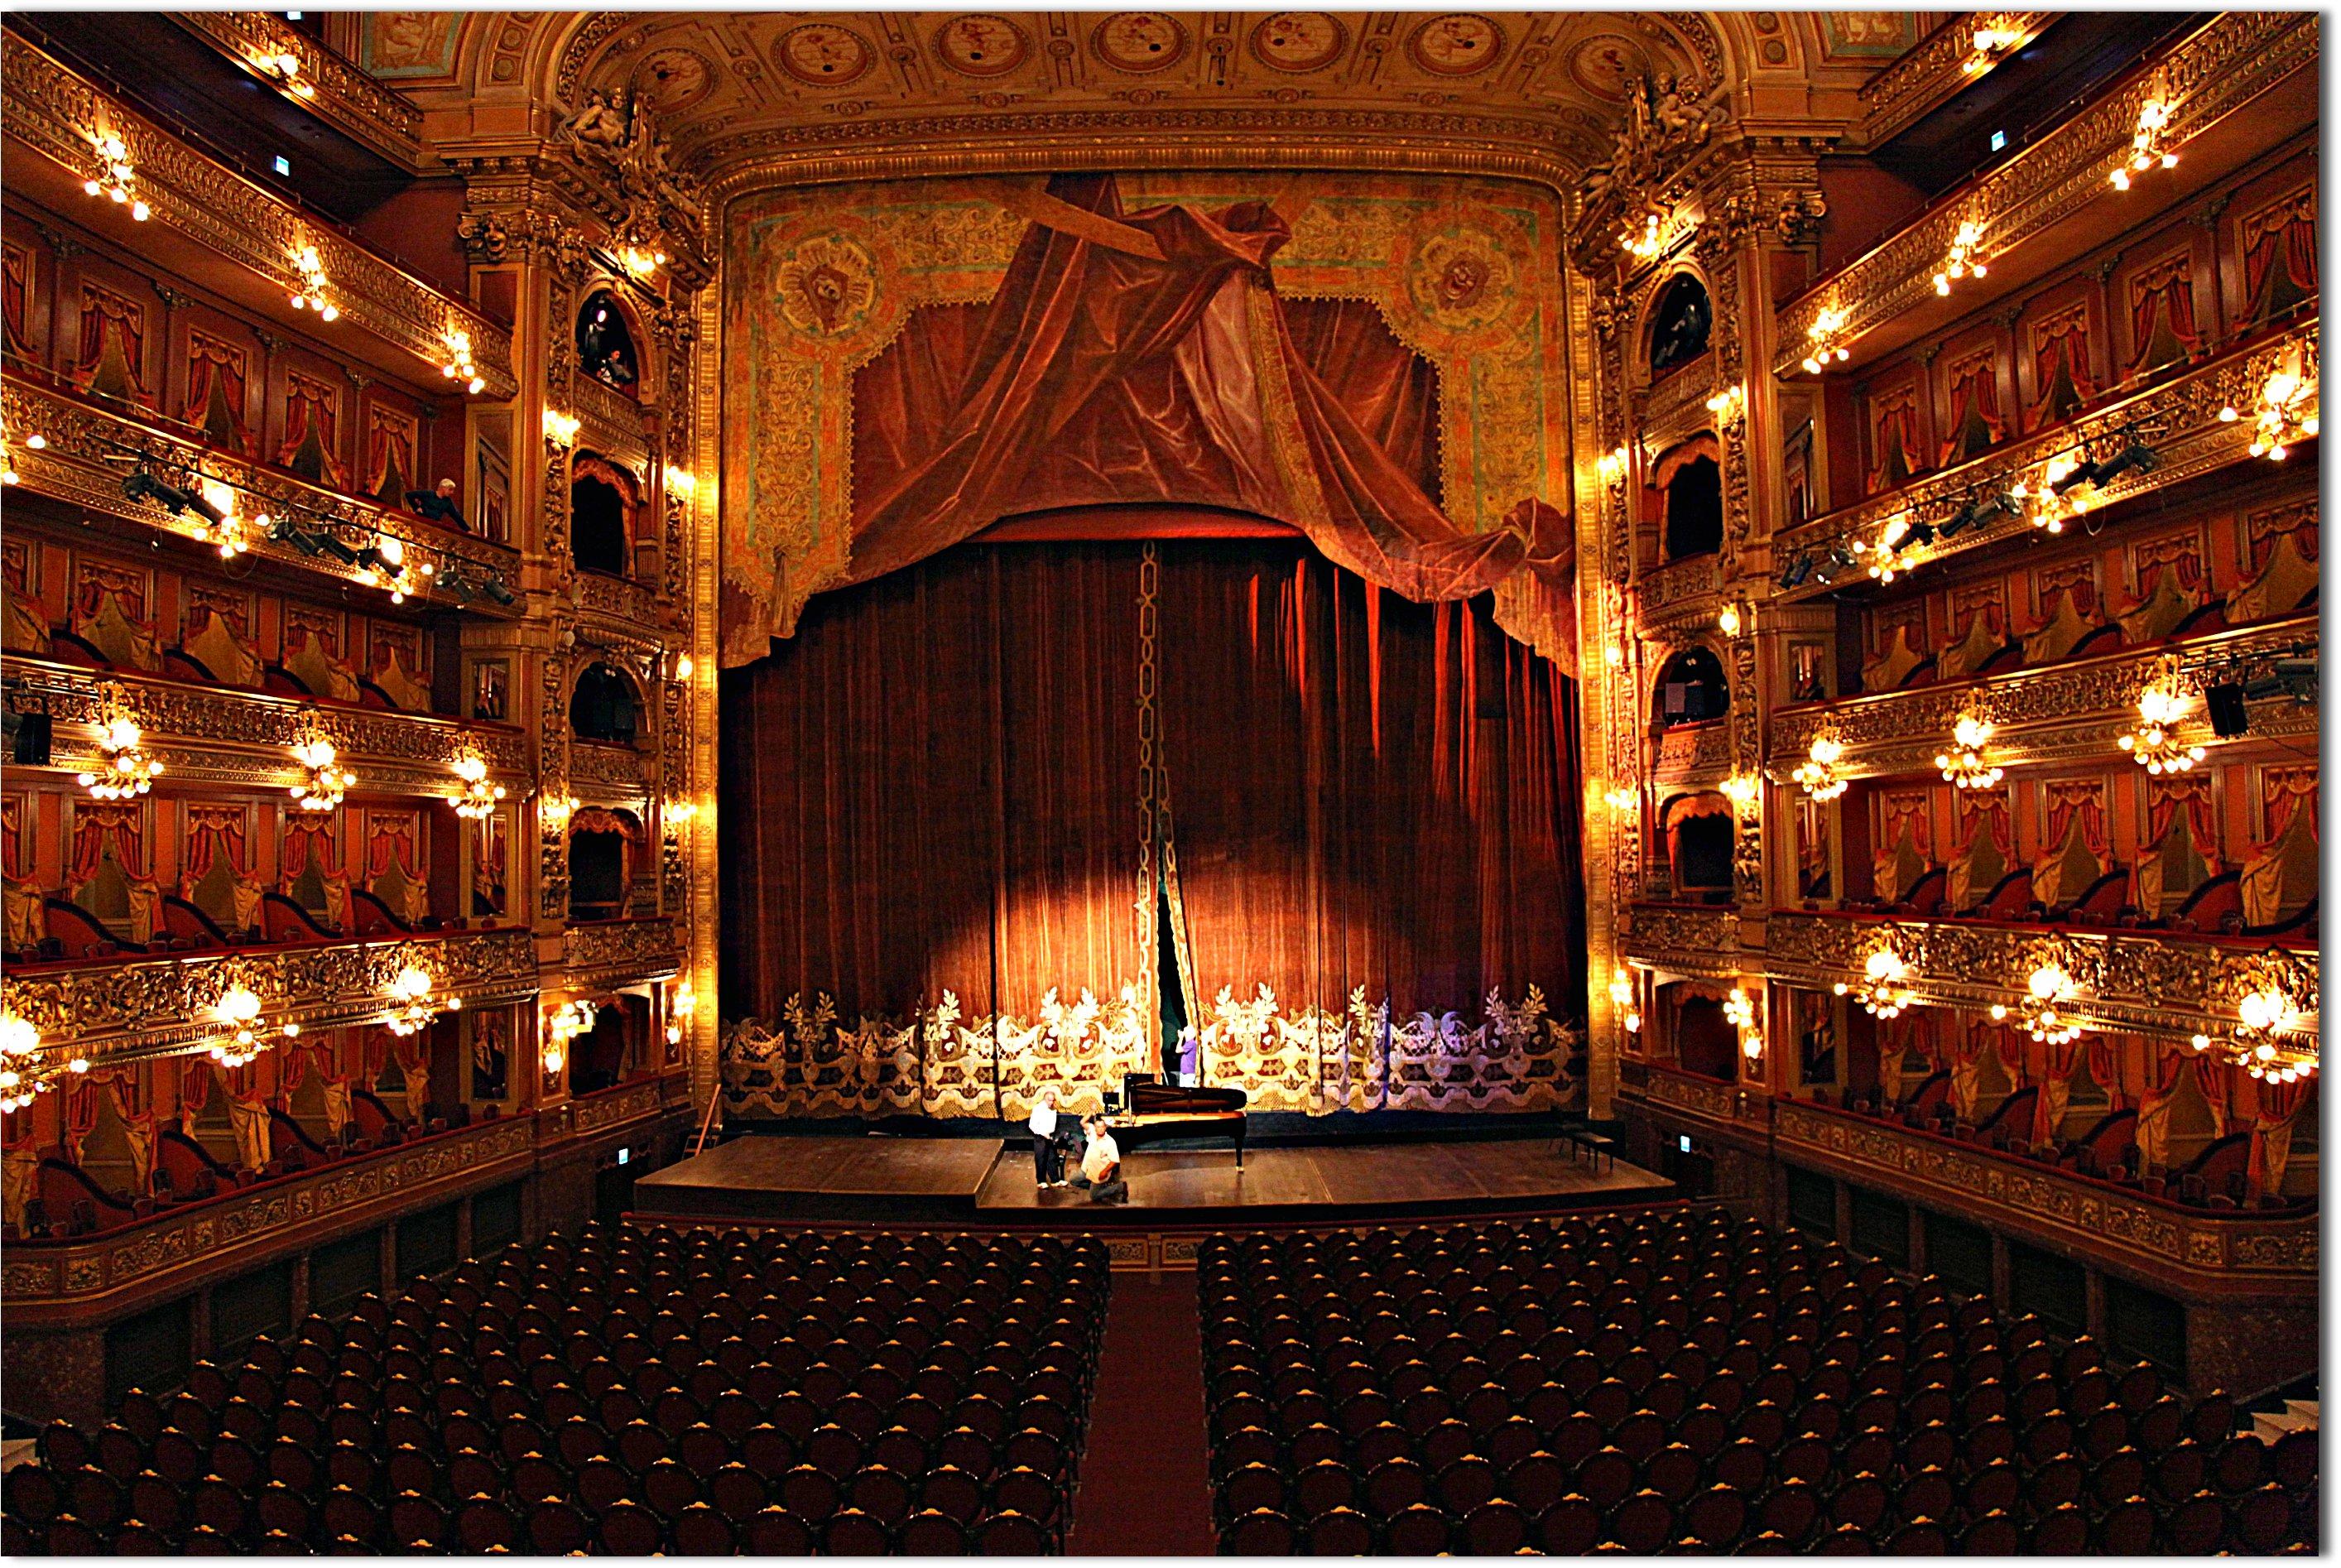 opera house bel canto